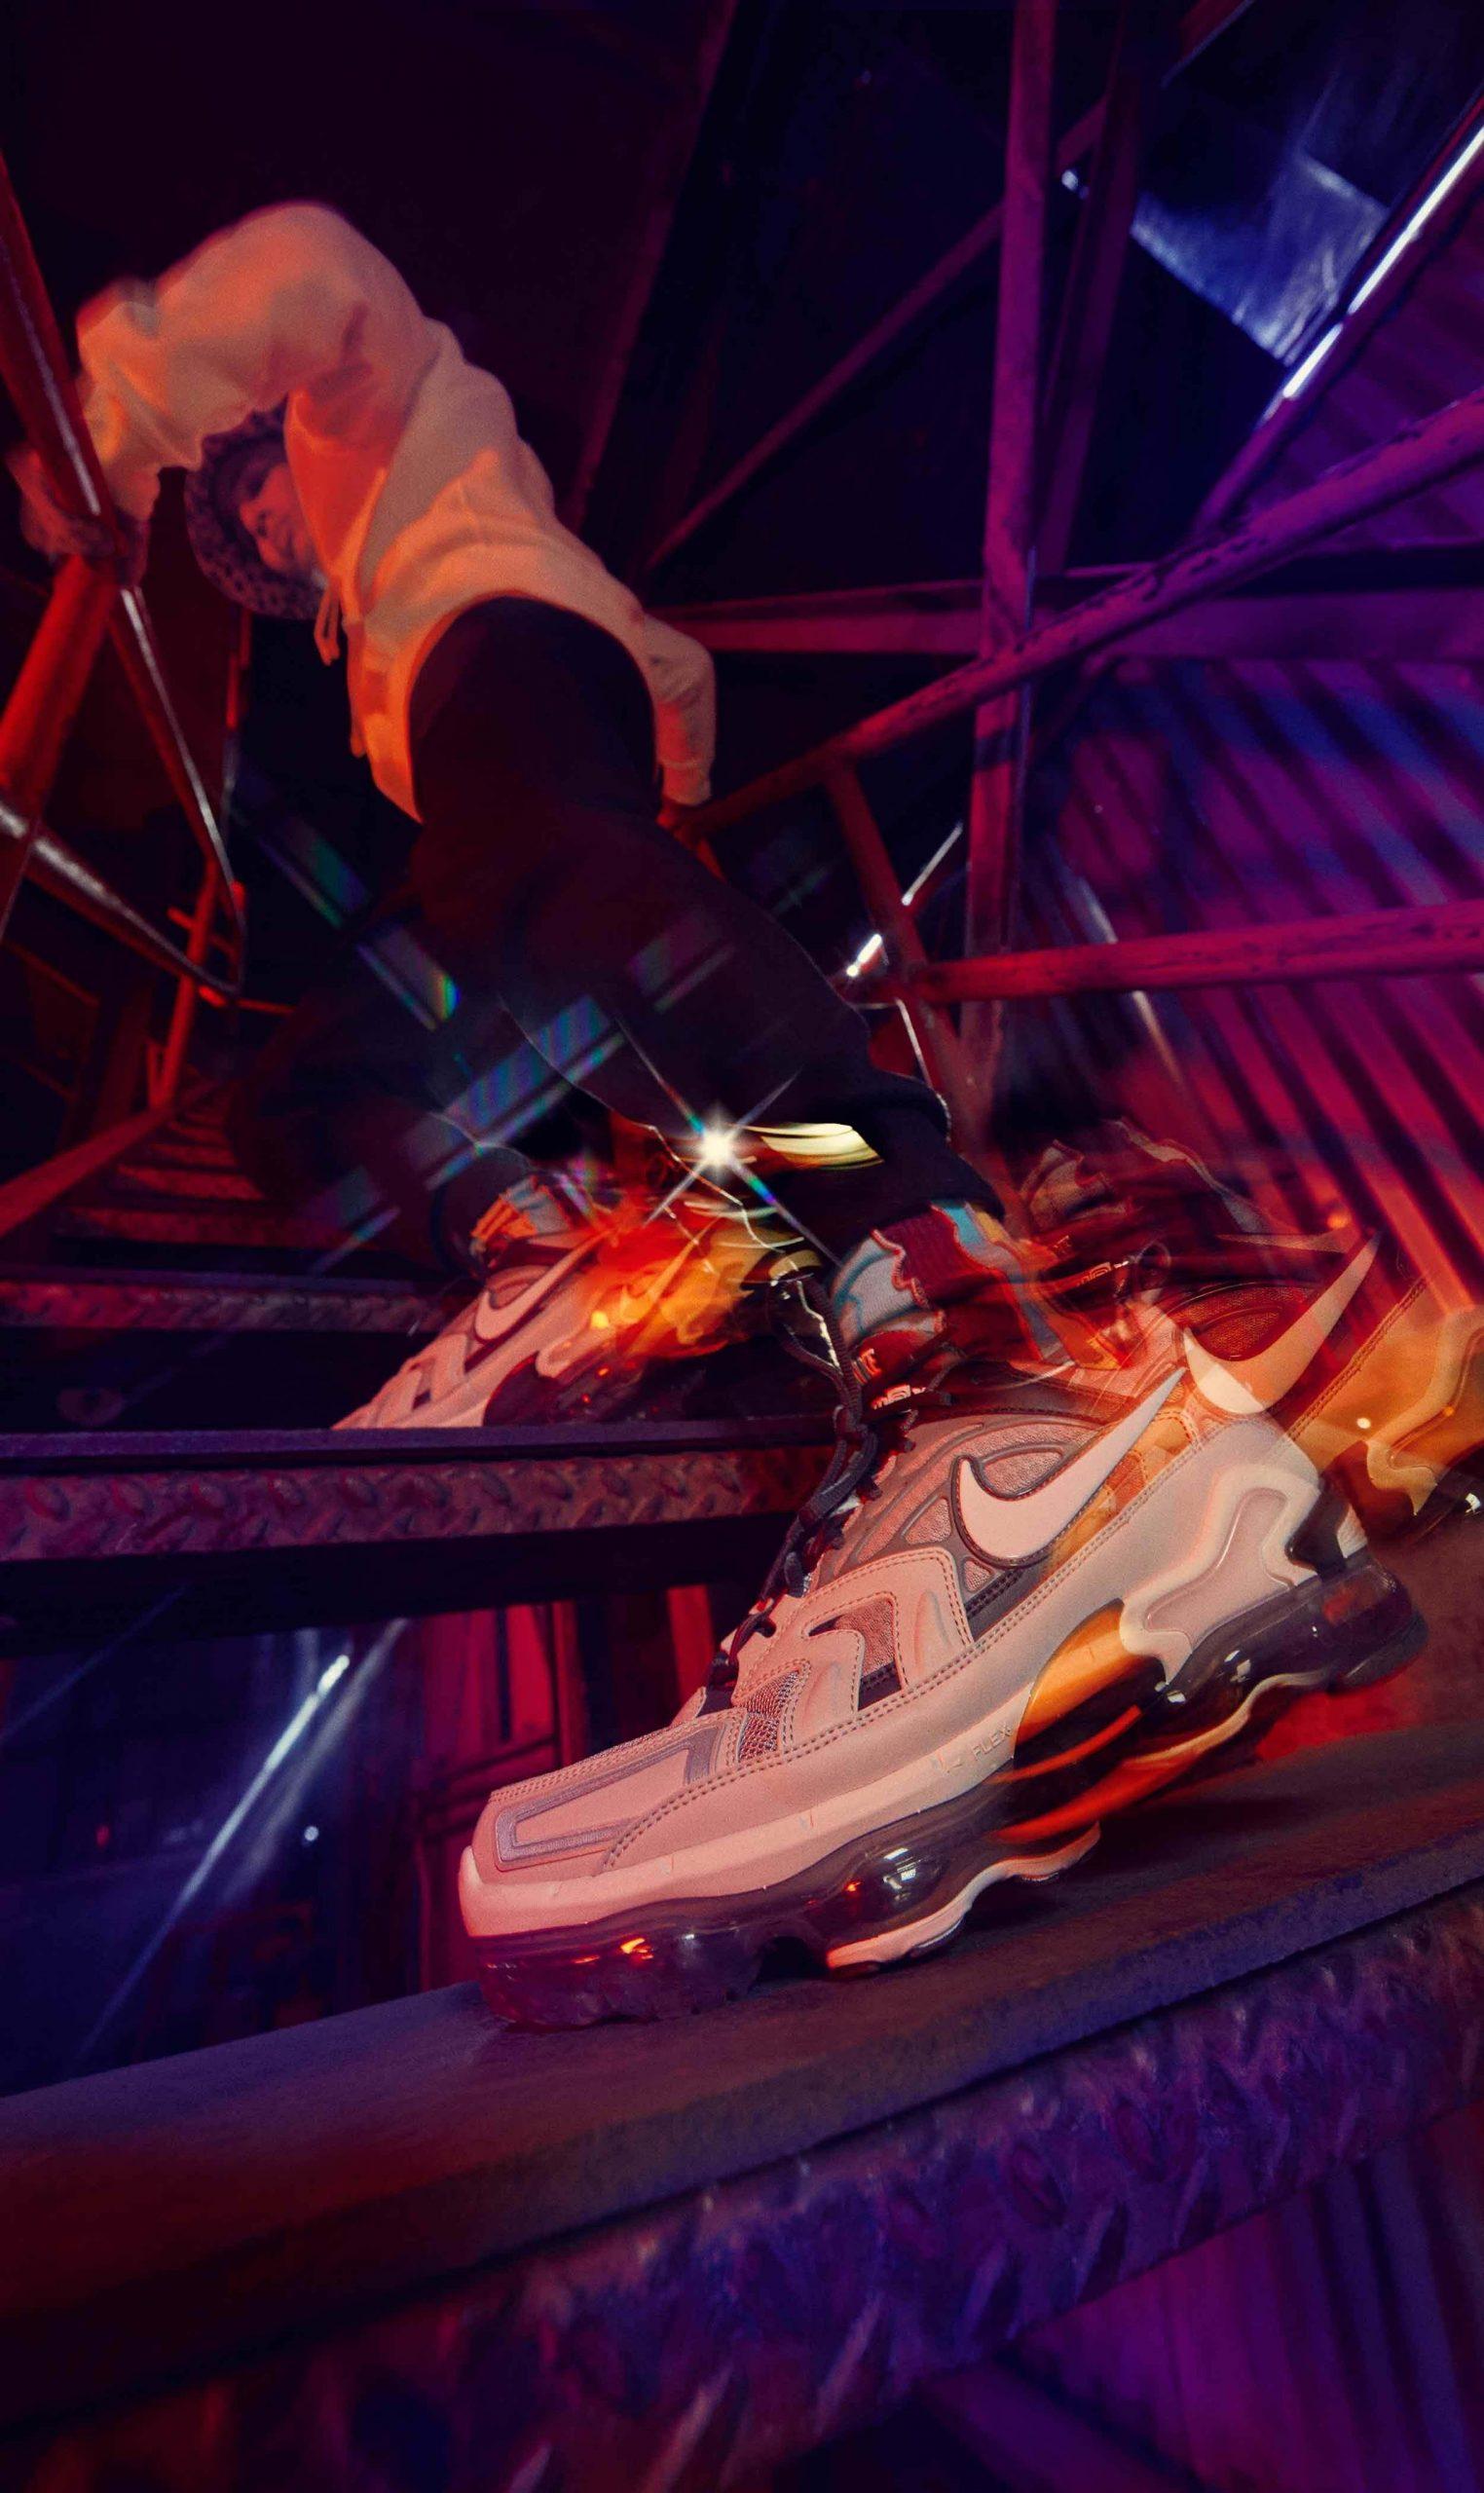 Nike Air Max Spring 2021 Collection Nike-Air-Max-VaporMax-Evo-3